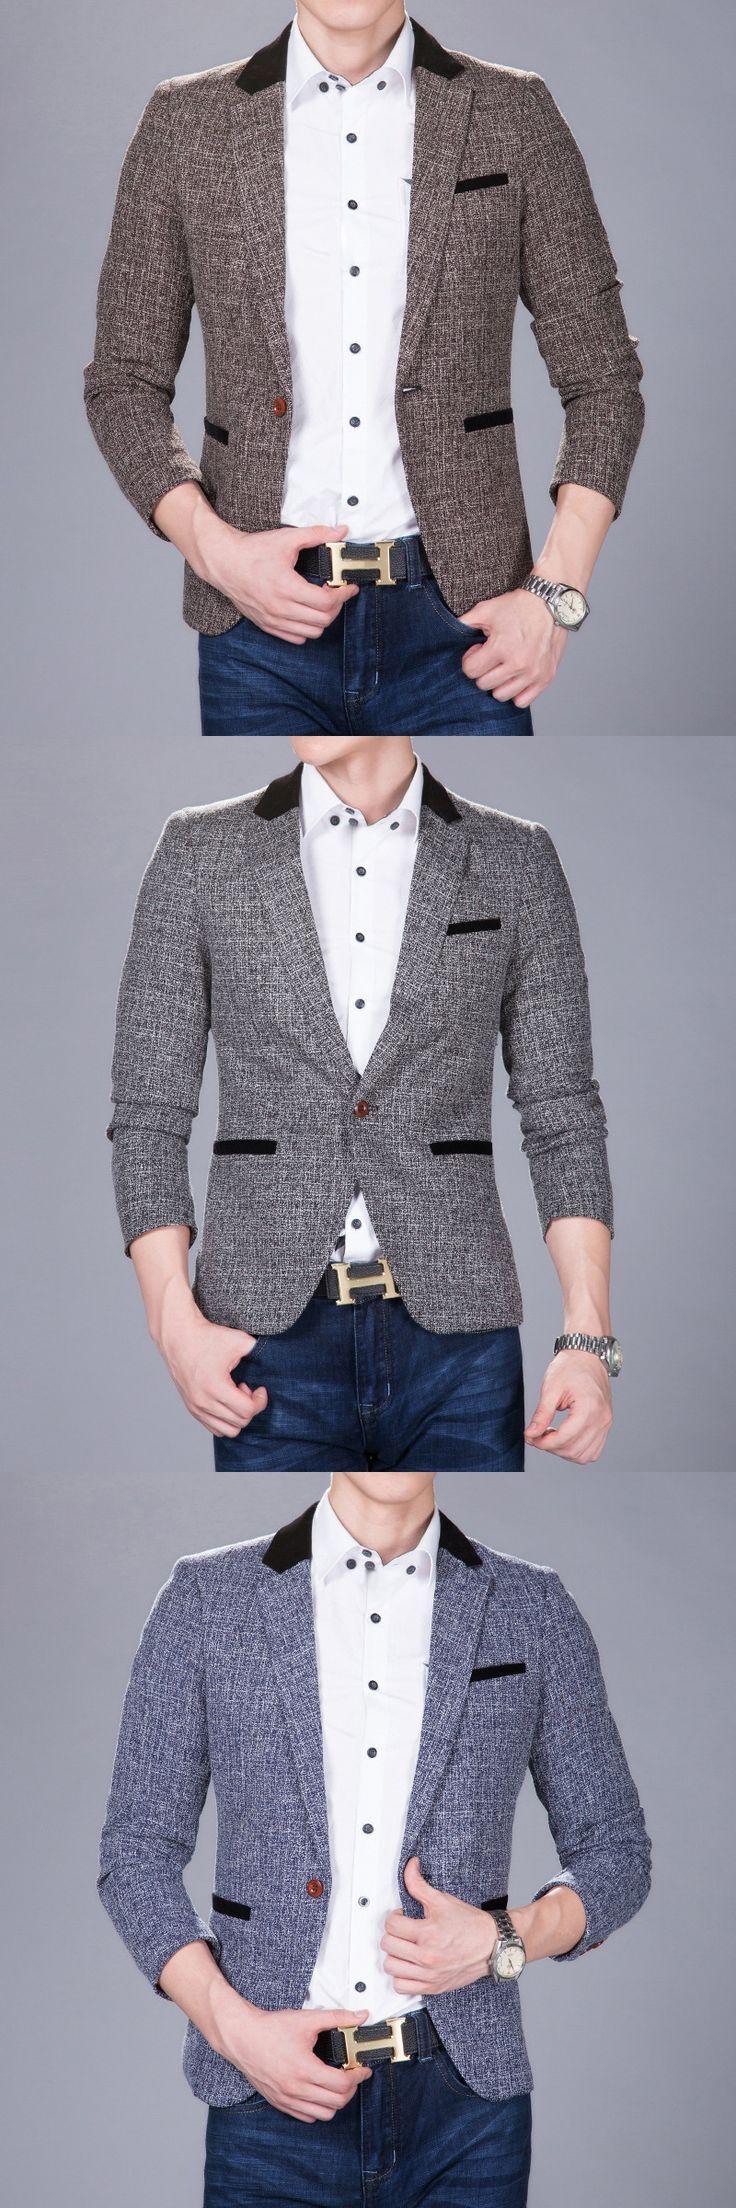 New Fashion Hot Sale Men's Blazer Mixed Colors Men Blazers Slim Casual Blazer Outerwear Coats Men Clothes High Quality Fabric